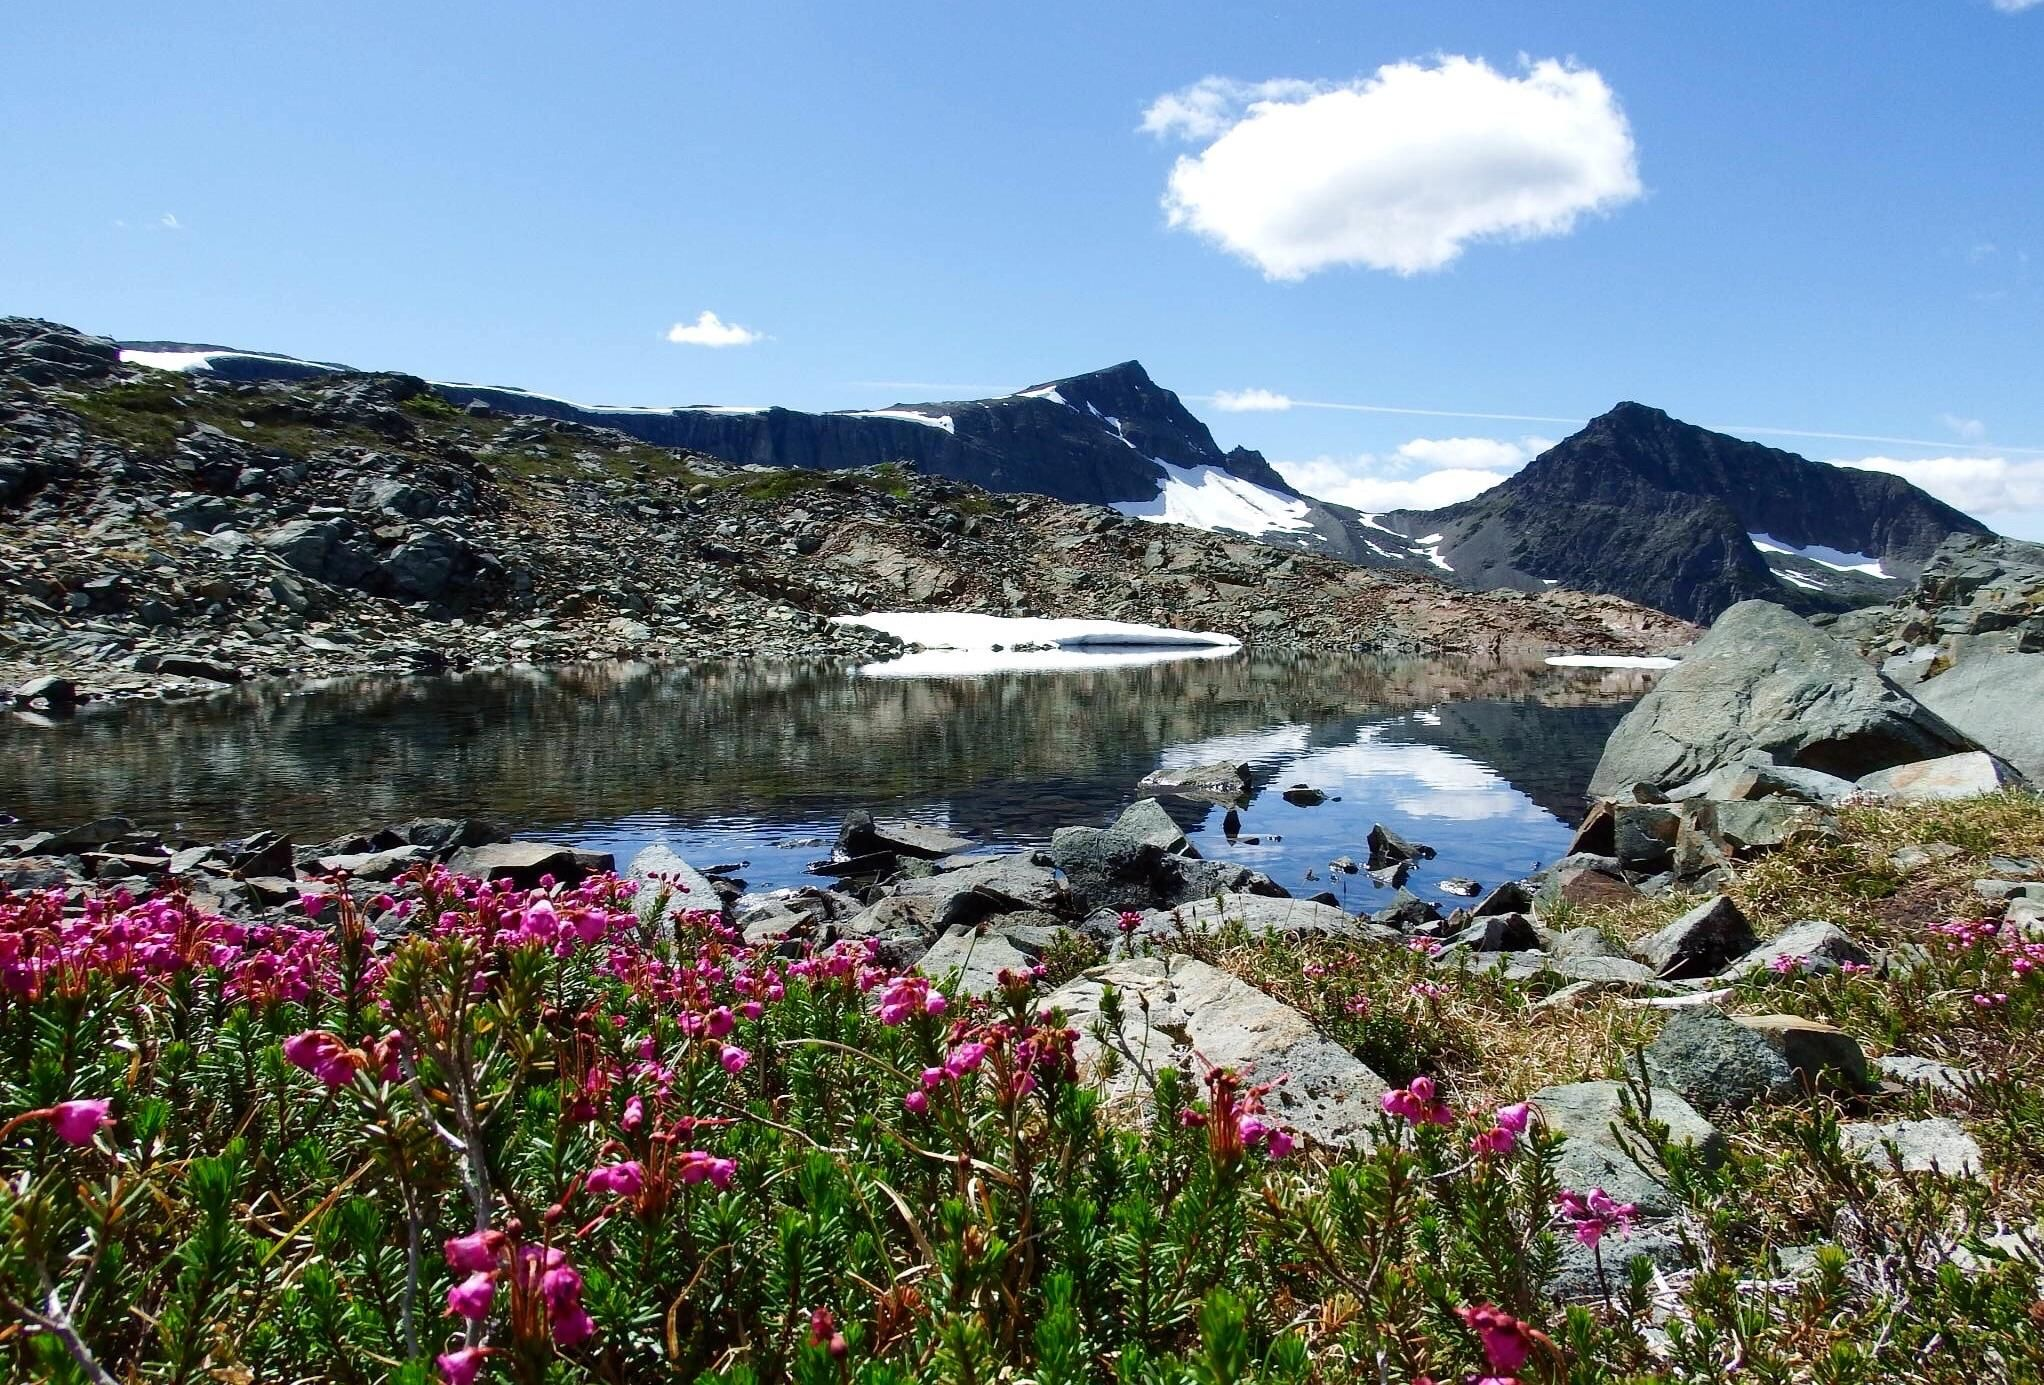 Alpine Tarn And Wildflowers On The Way To Mt Albert Edward